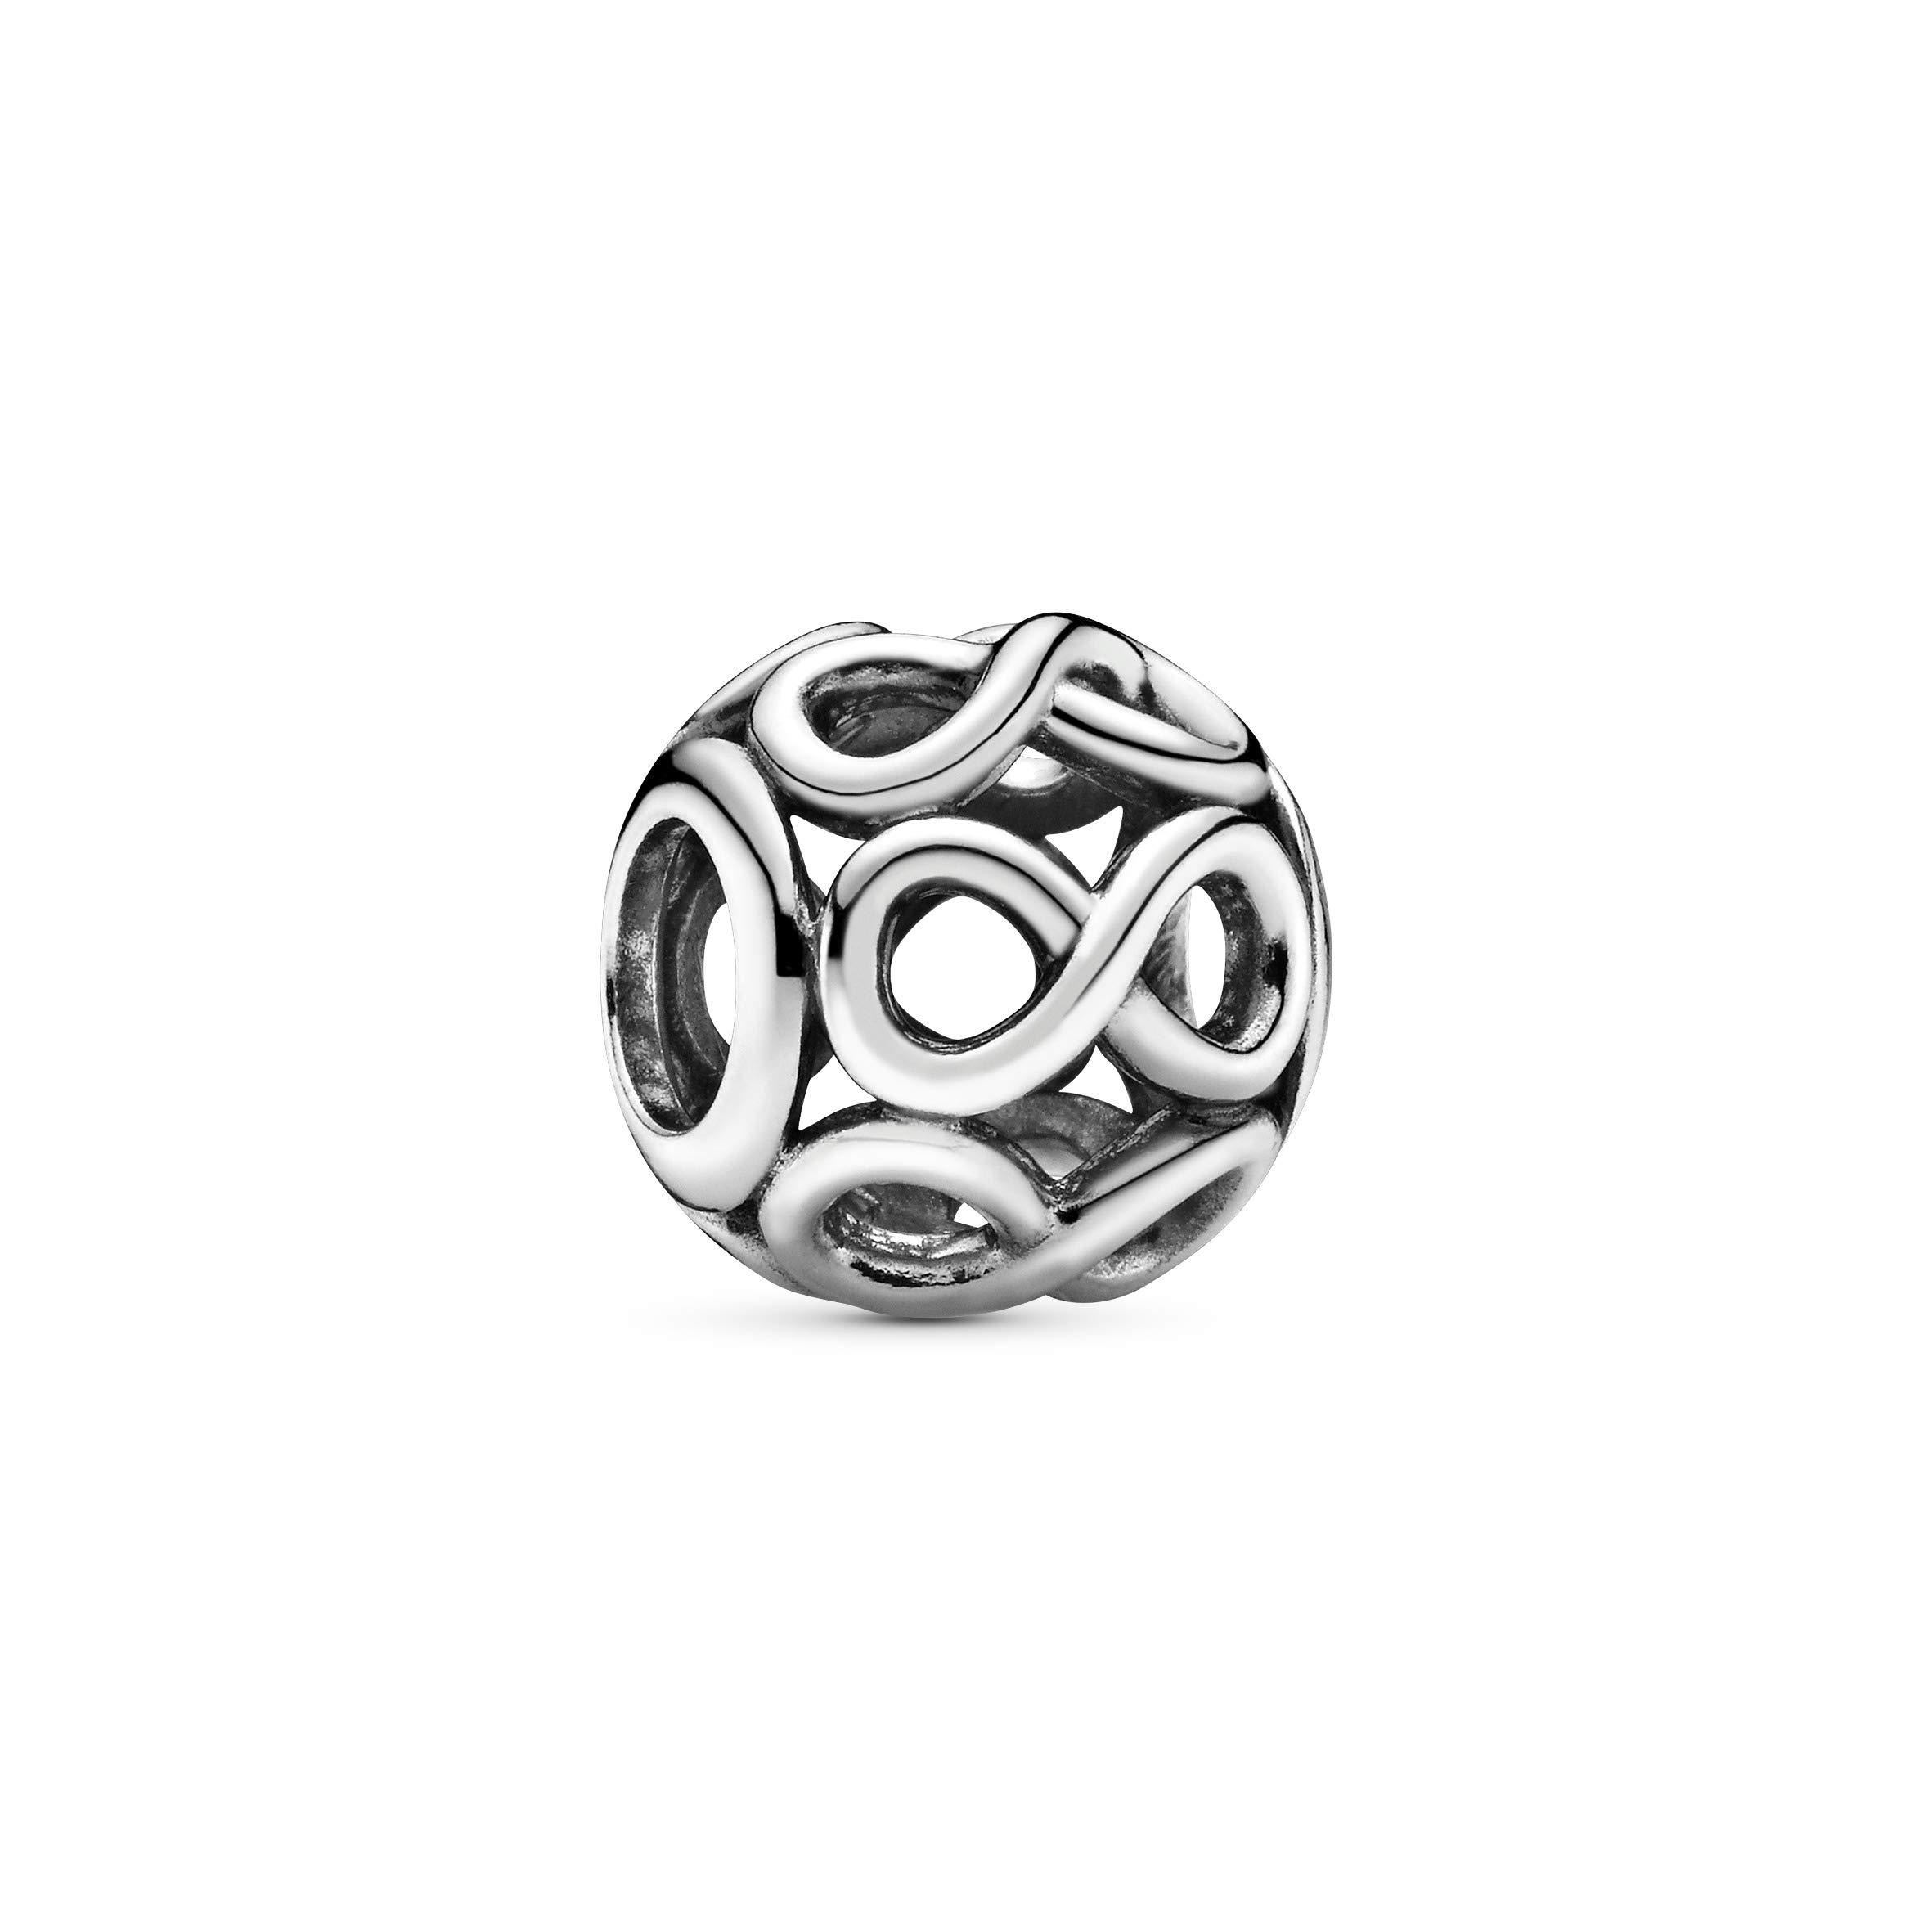 Pandora Jewelry Infinite Shine Sterling Silver Charm